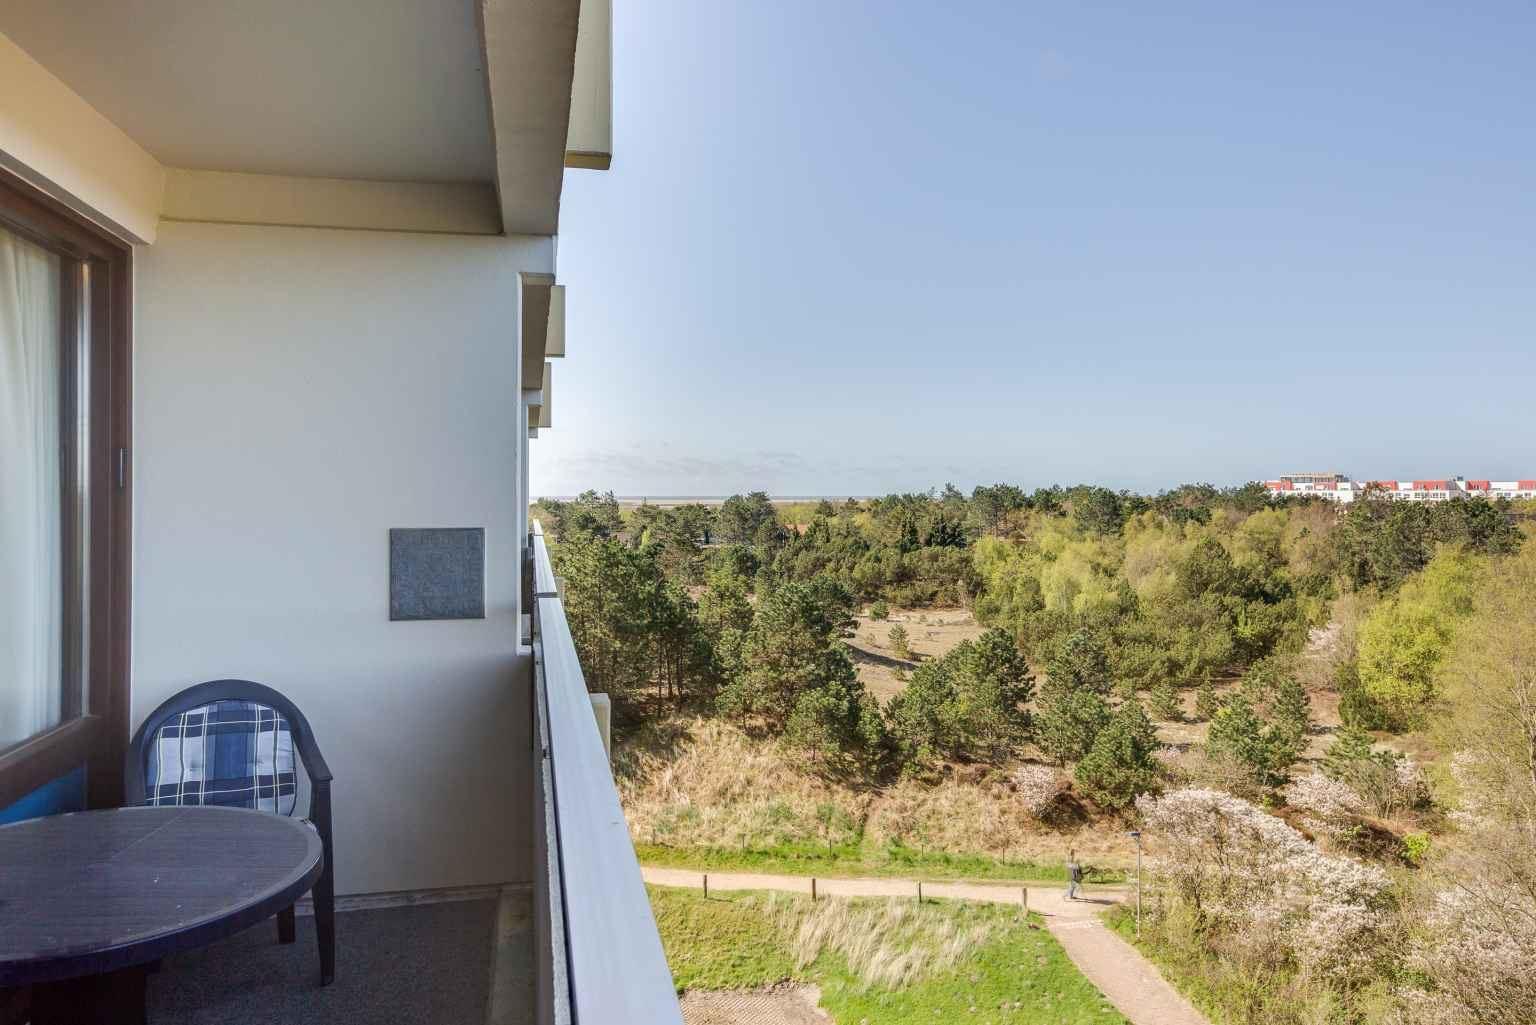 Balkon mit Meerblick, Ferienwohnung Nr. 80, St Peter Ording Bad, Haus Atlantic,  Alter Badweg 11-15